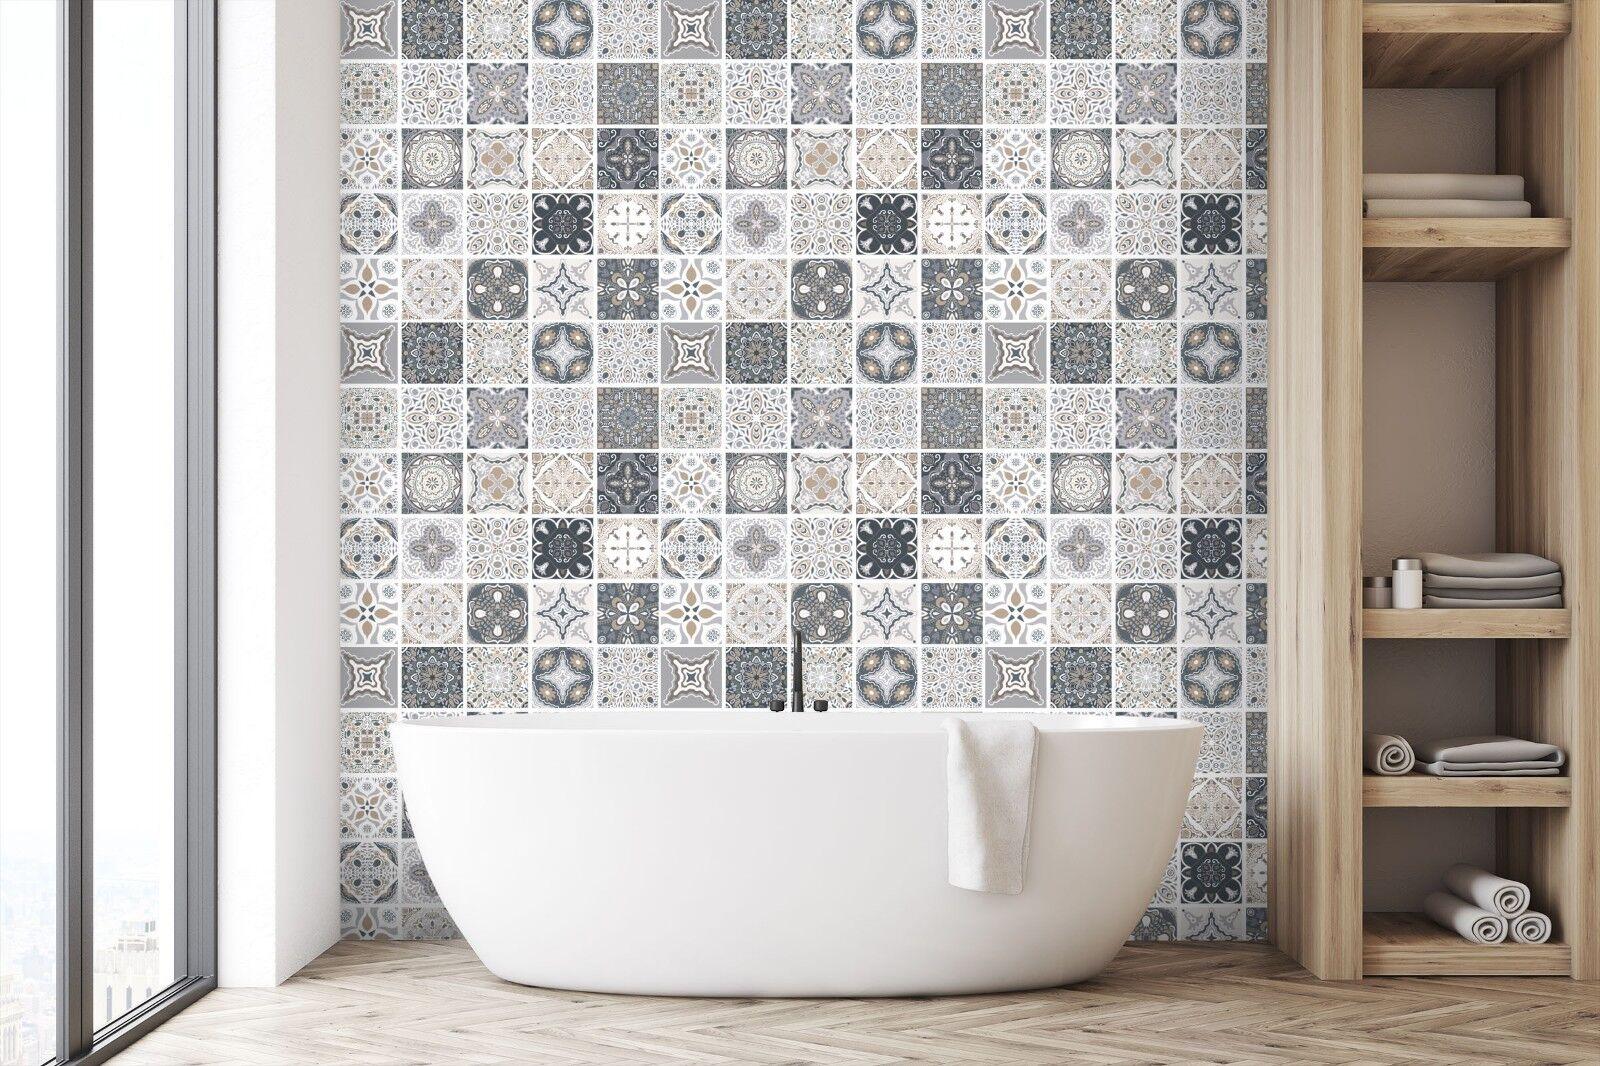 3D Heiße Blumen Grau 2 Textur Fliesen Marmor Tapeten Abziehbild Tapete Wandbild